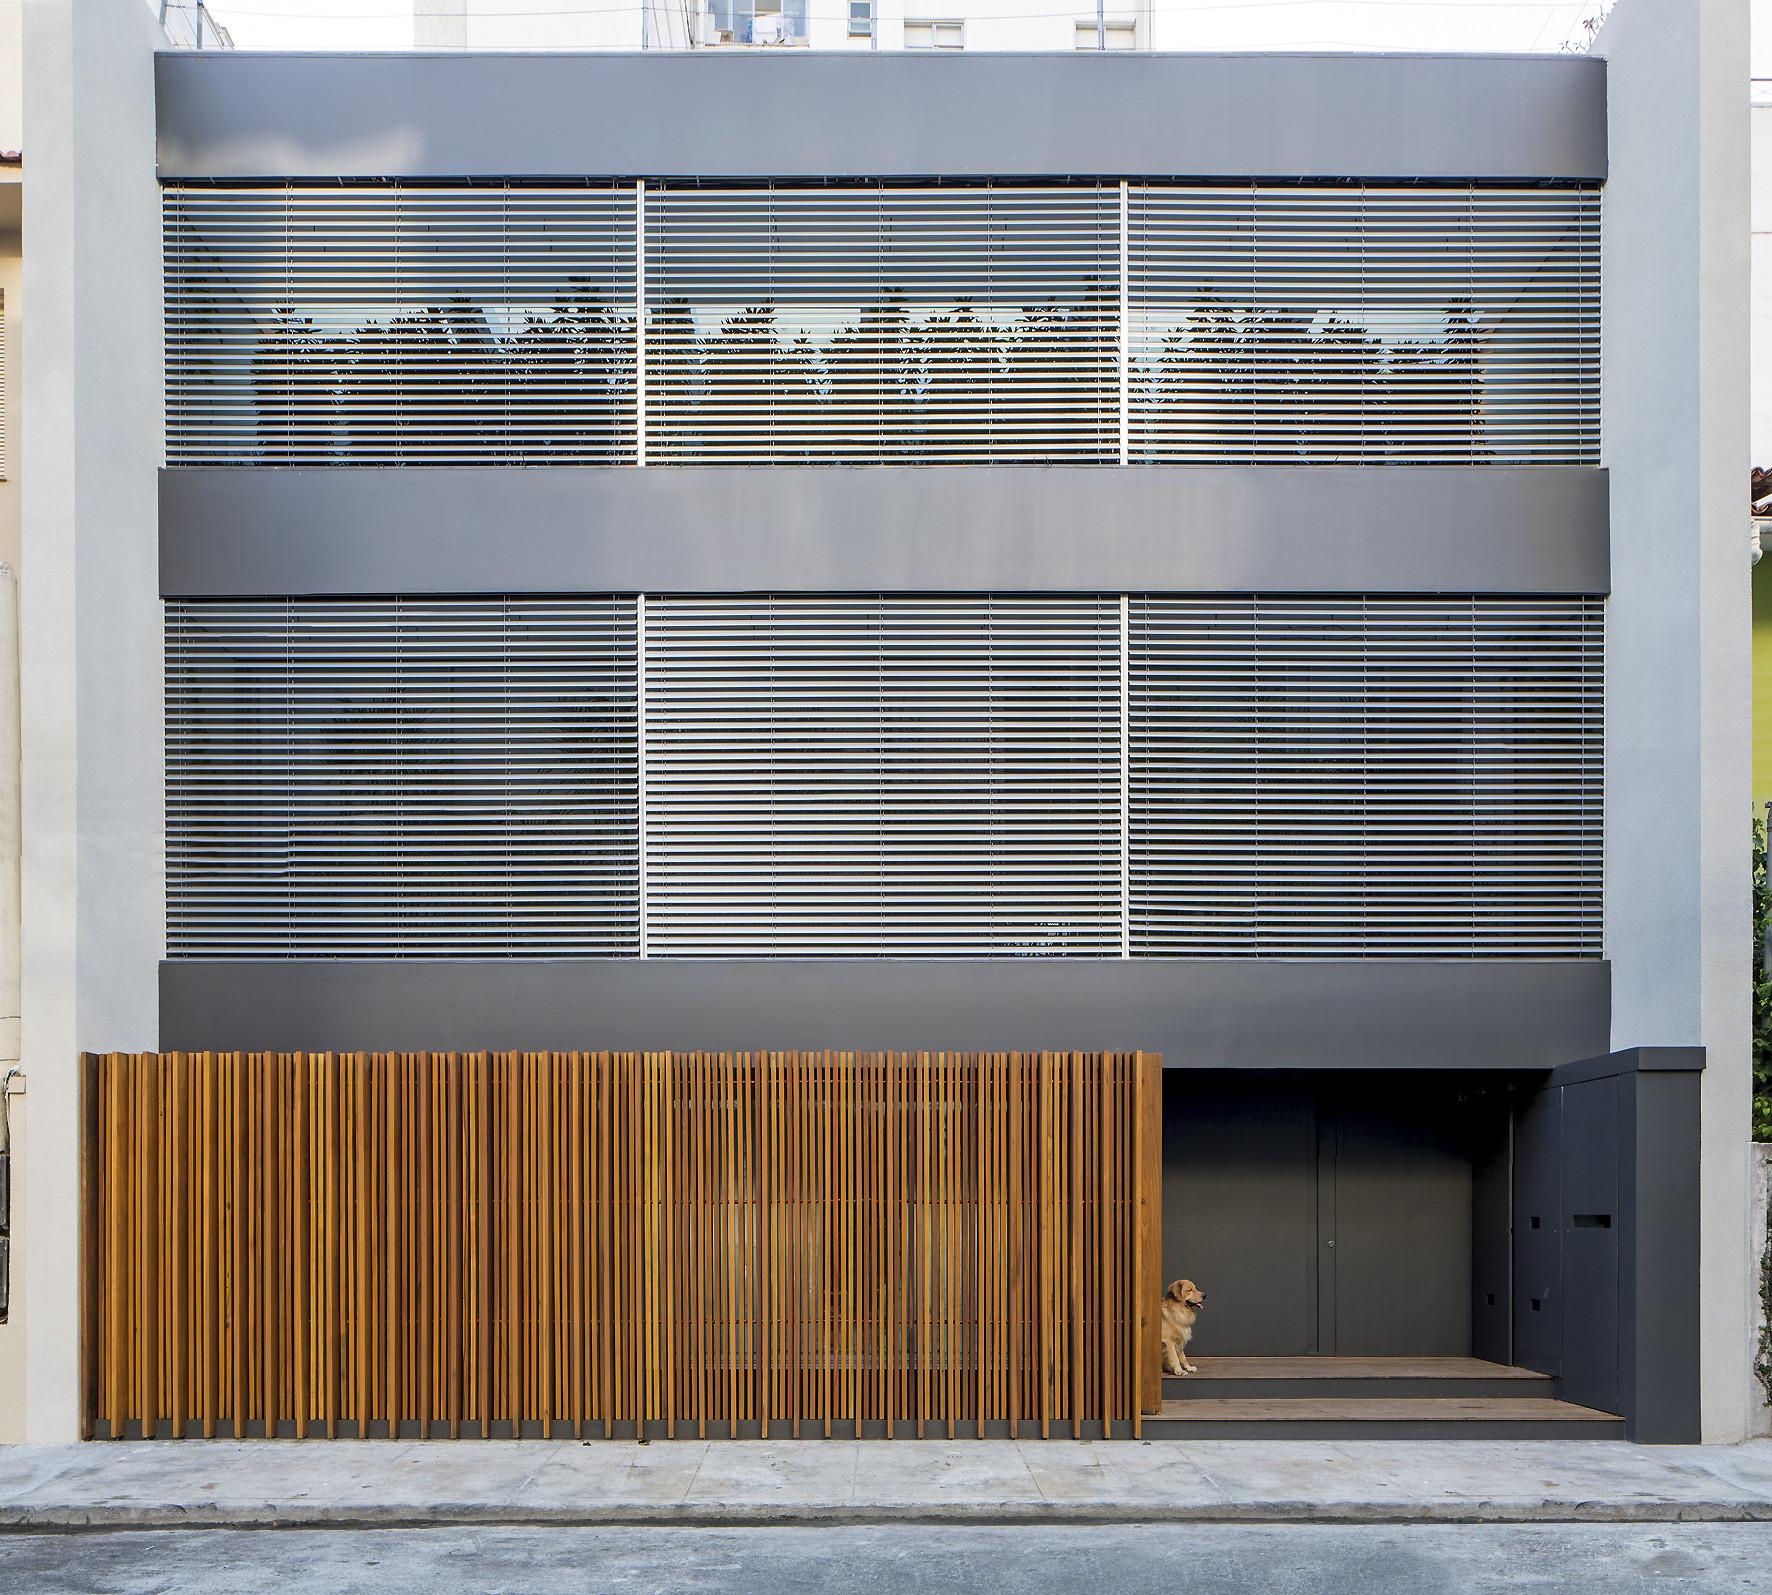 Casa 12x12 / Bernardes Arquitetura, © Leonardo Finotti